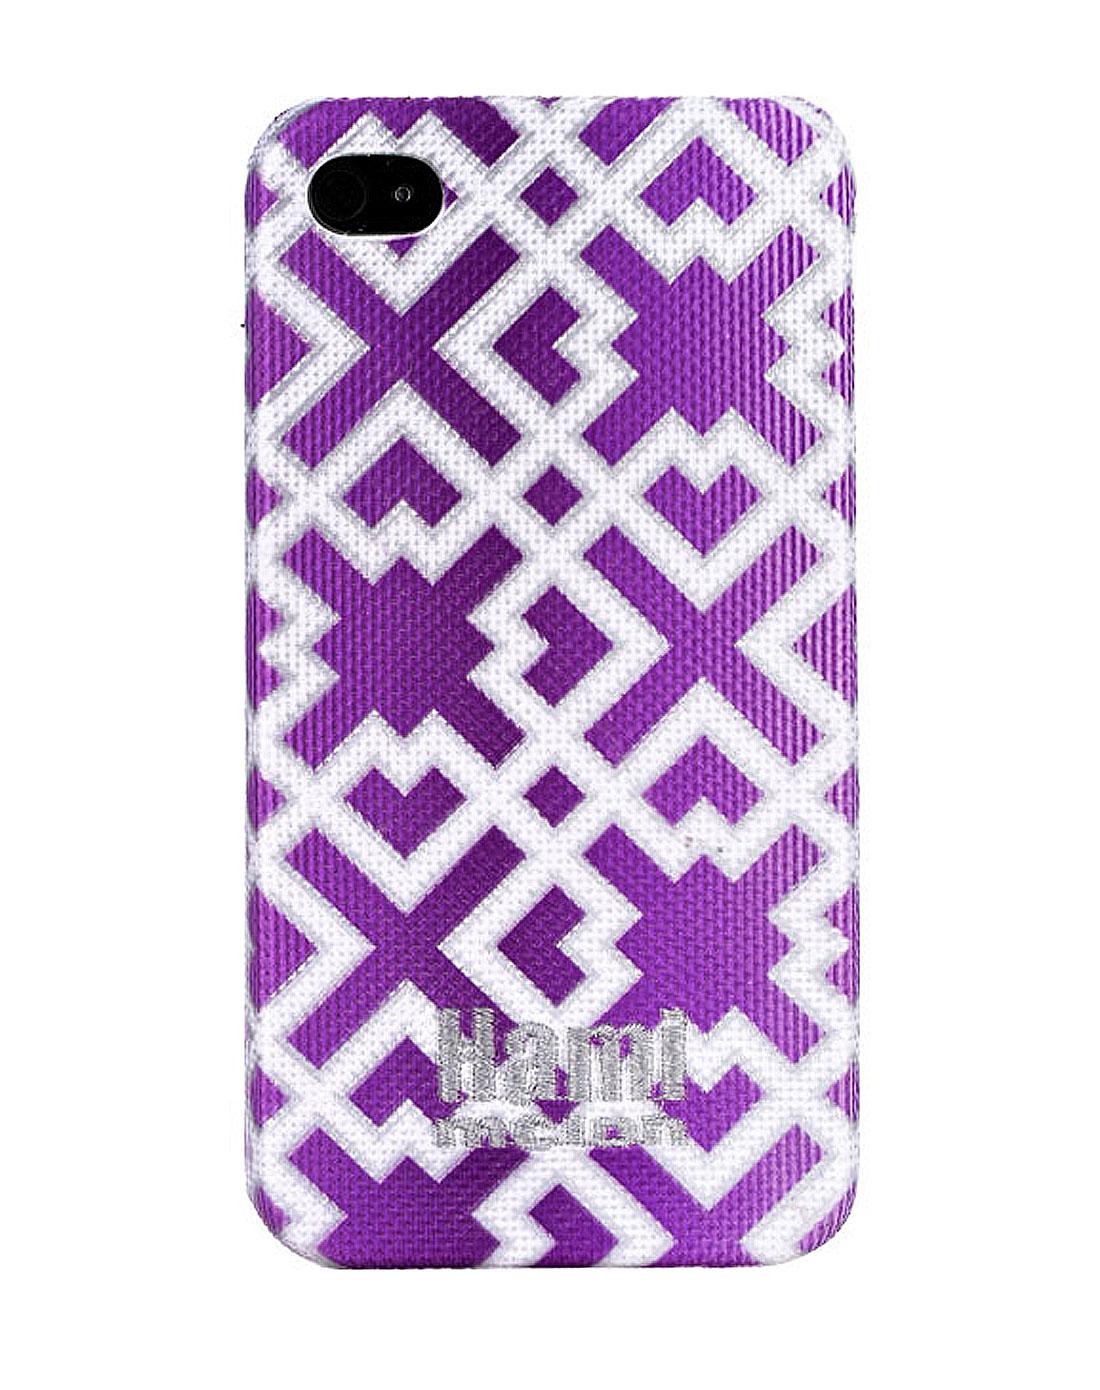 iphone 4/4s后壳- 紫色渐变背景加银色中国窗花